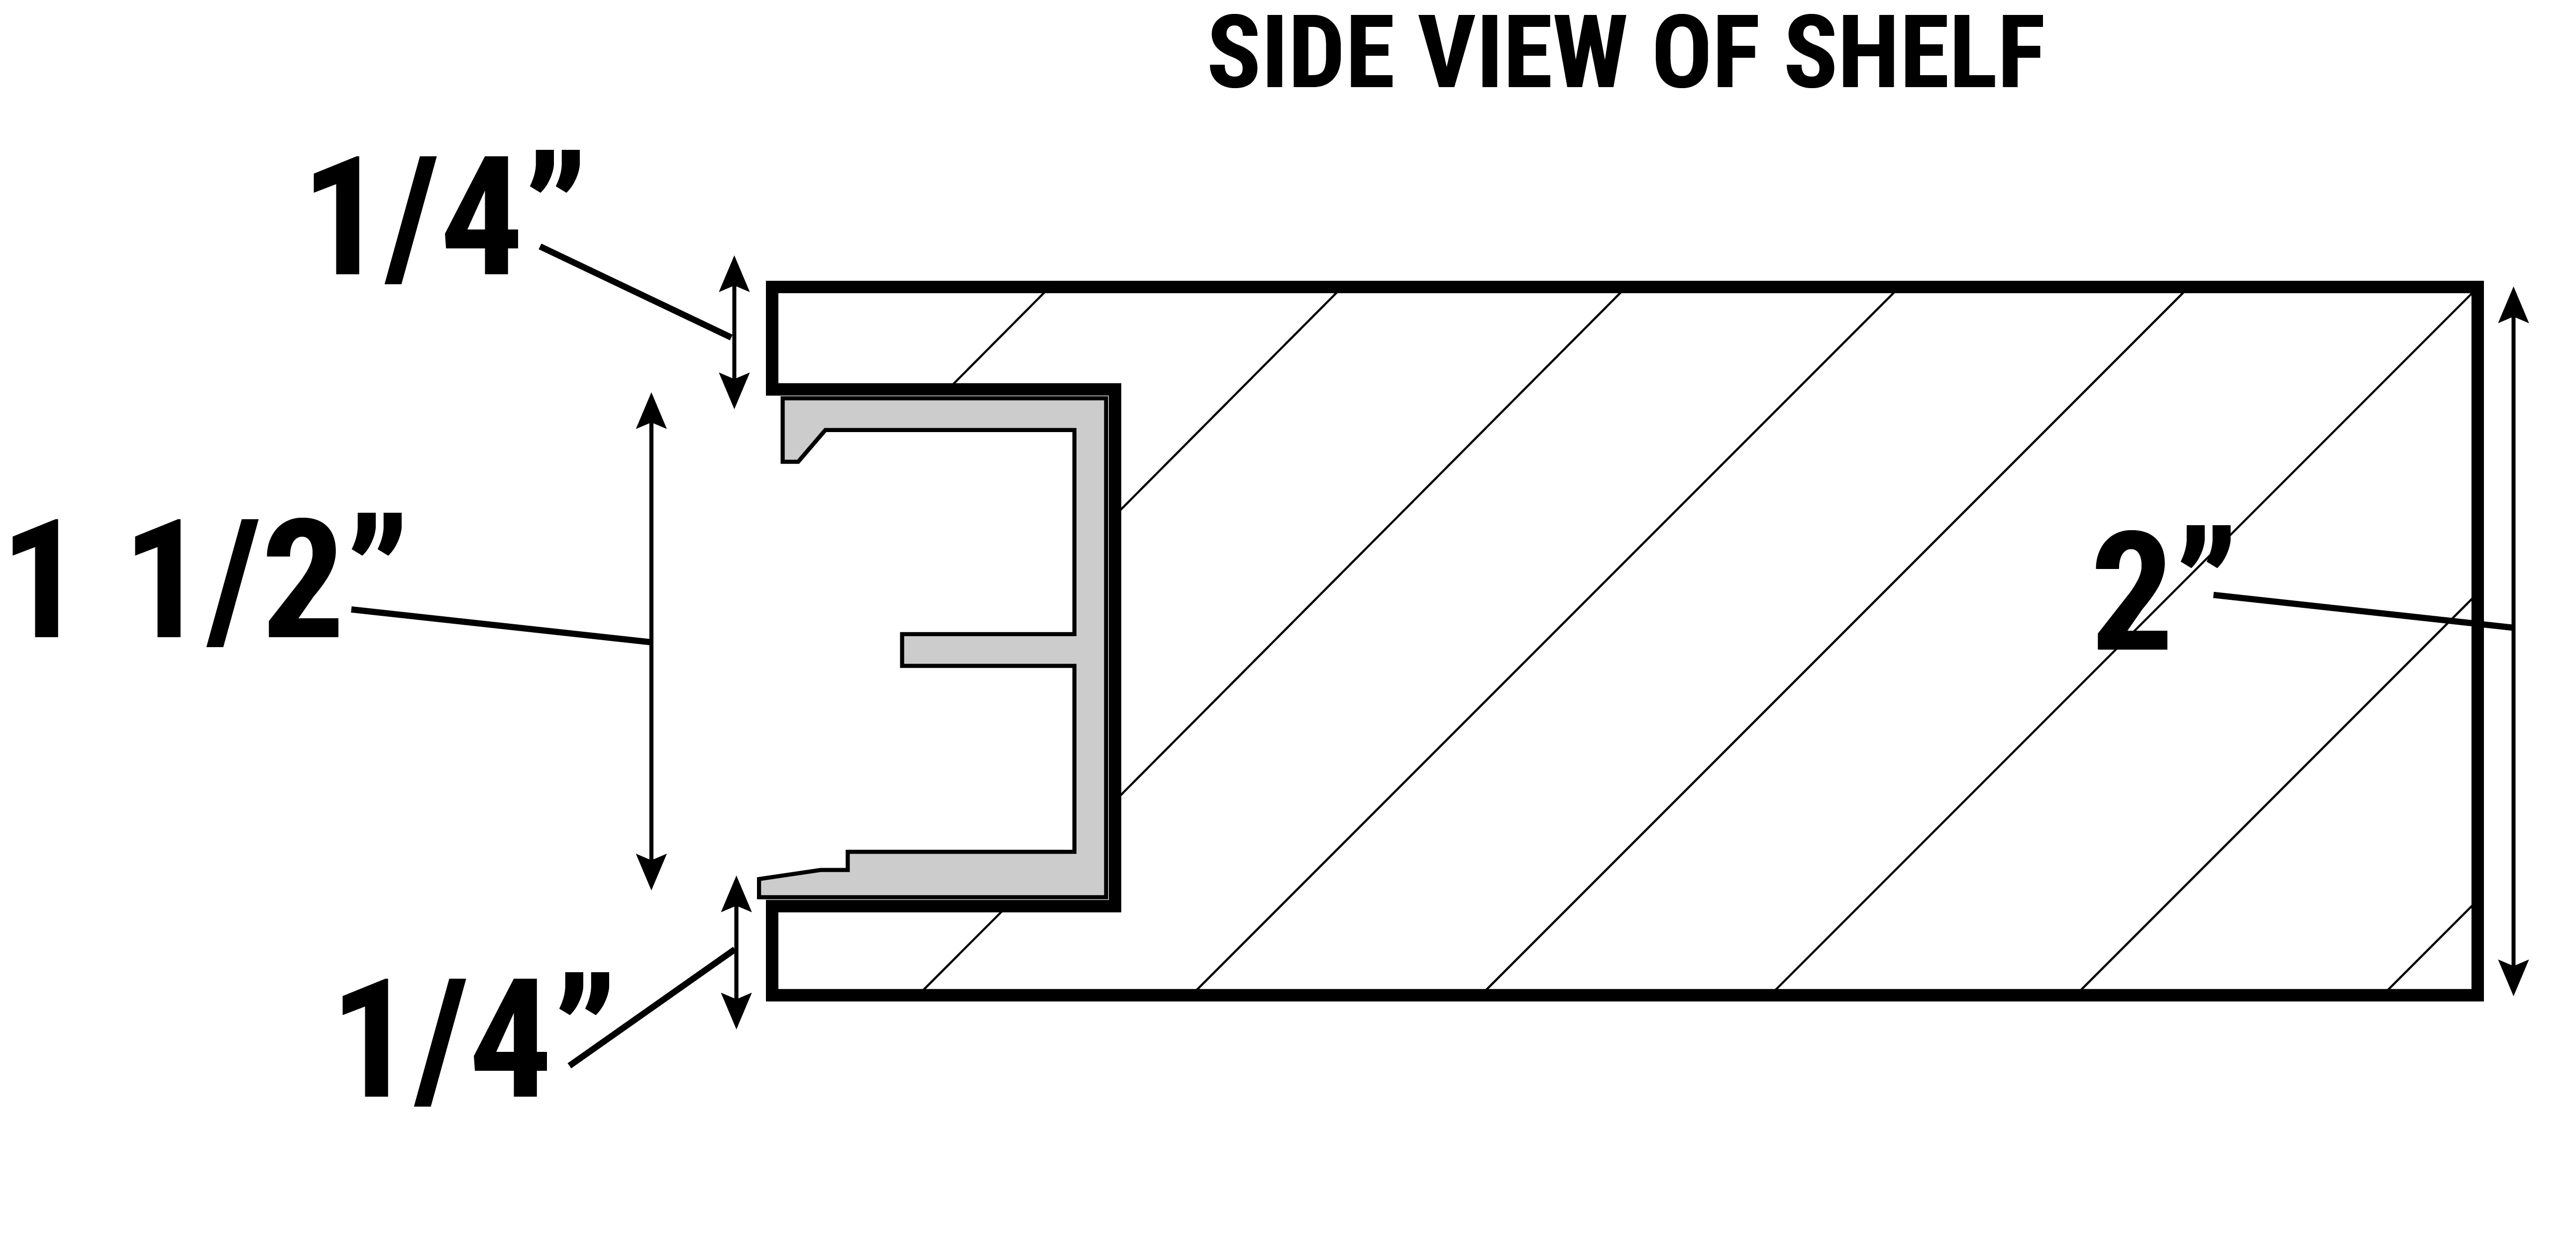 Minimum_Shelf_Height.png